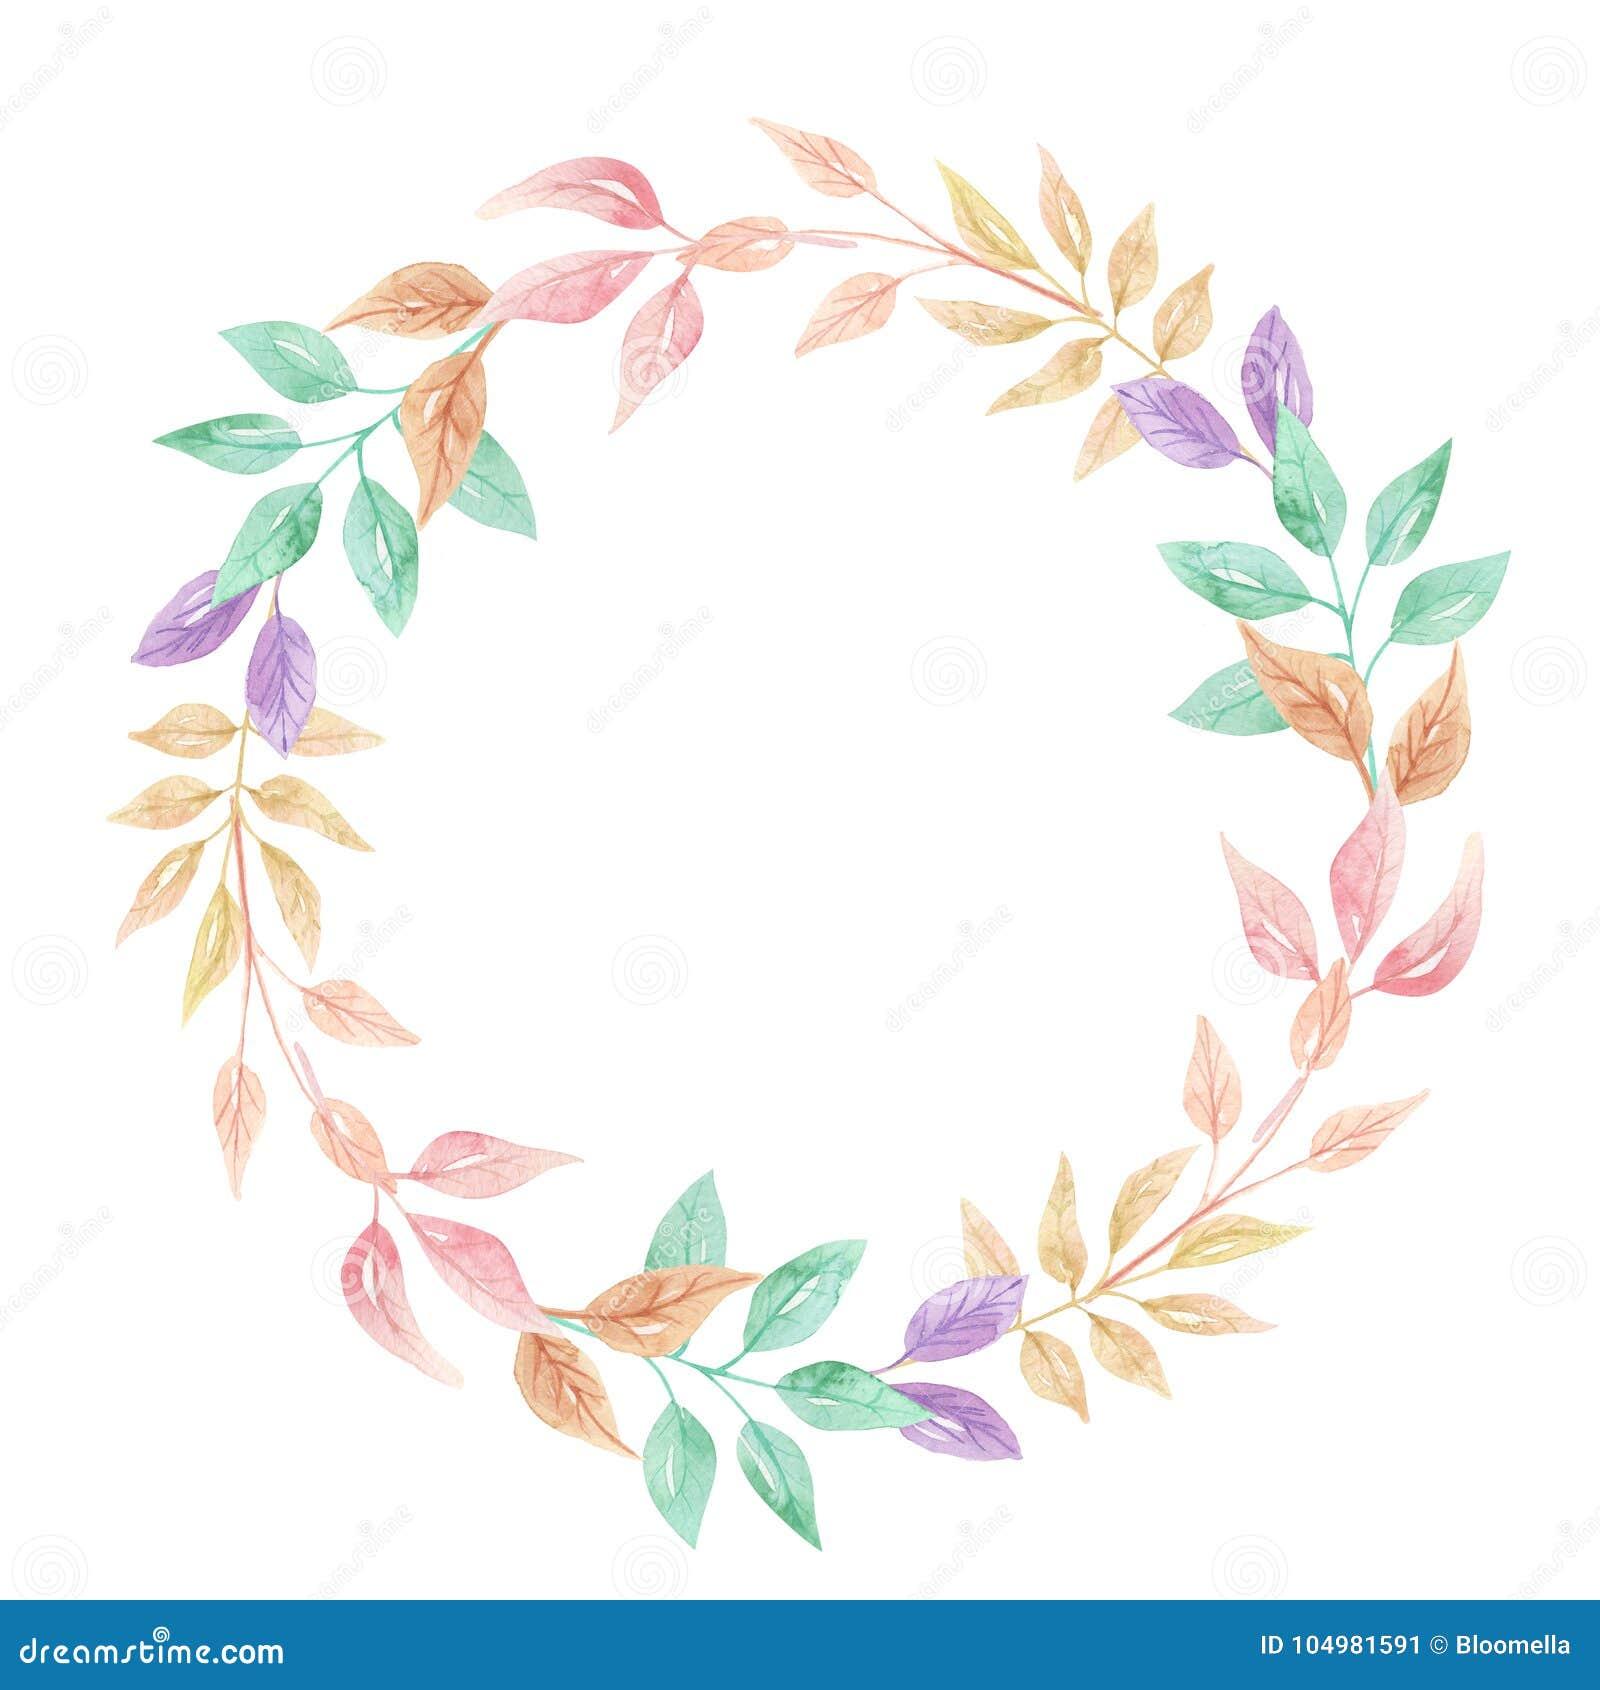 watercolor foliage summer leaves digital peach lilac wreath garland